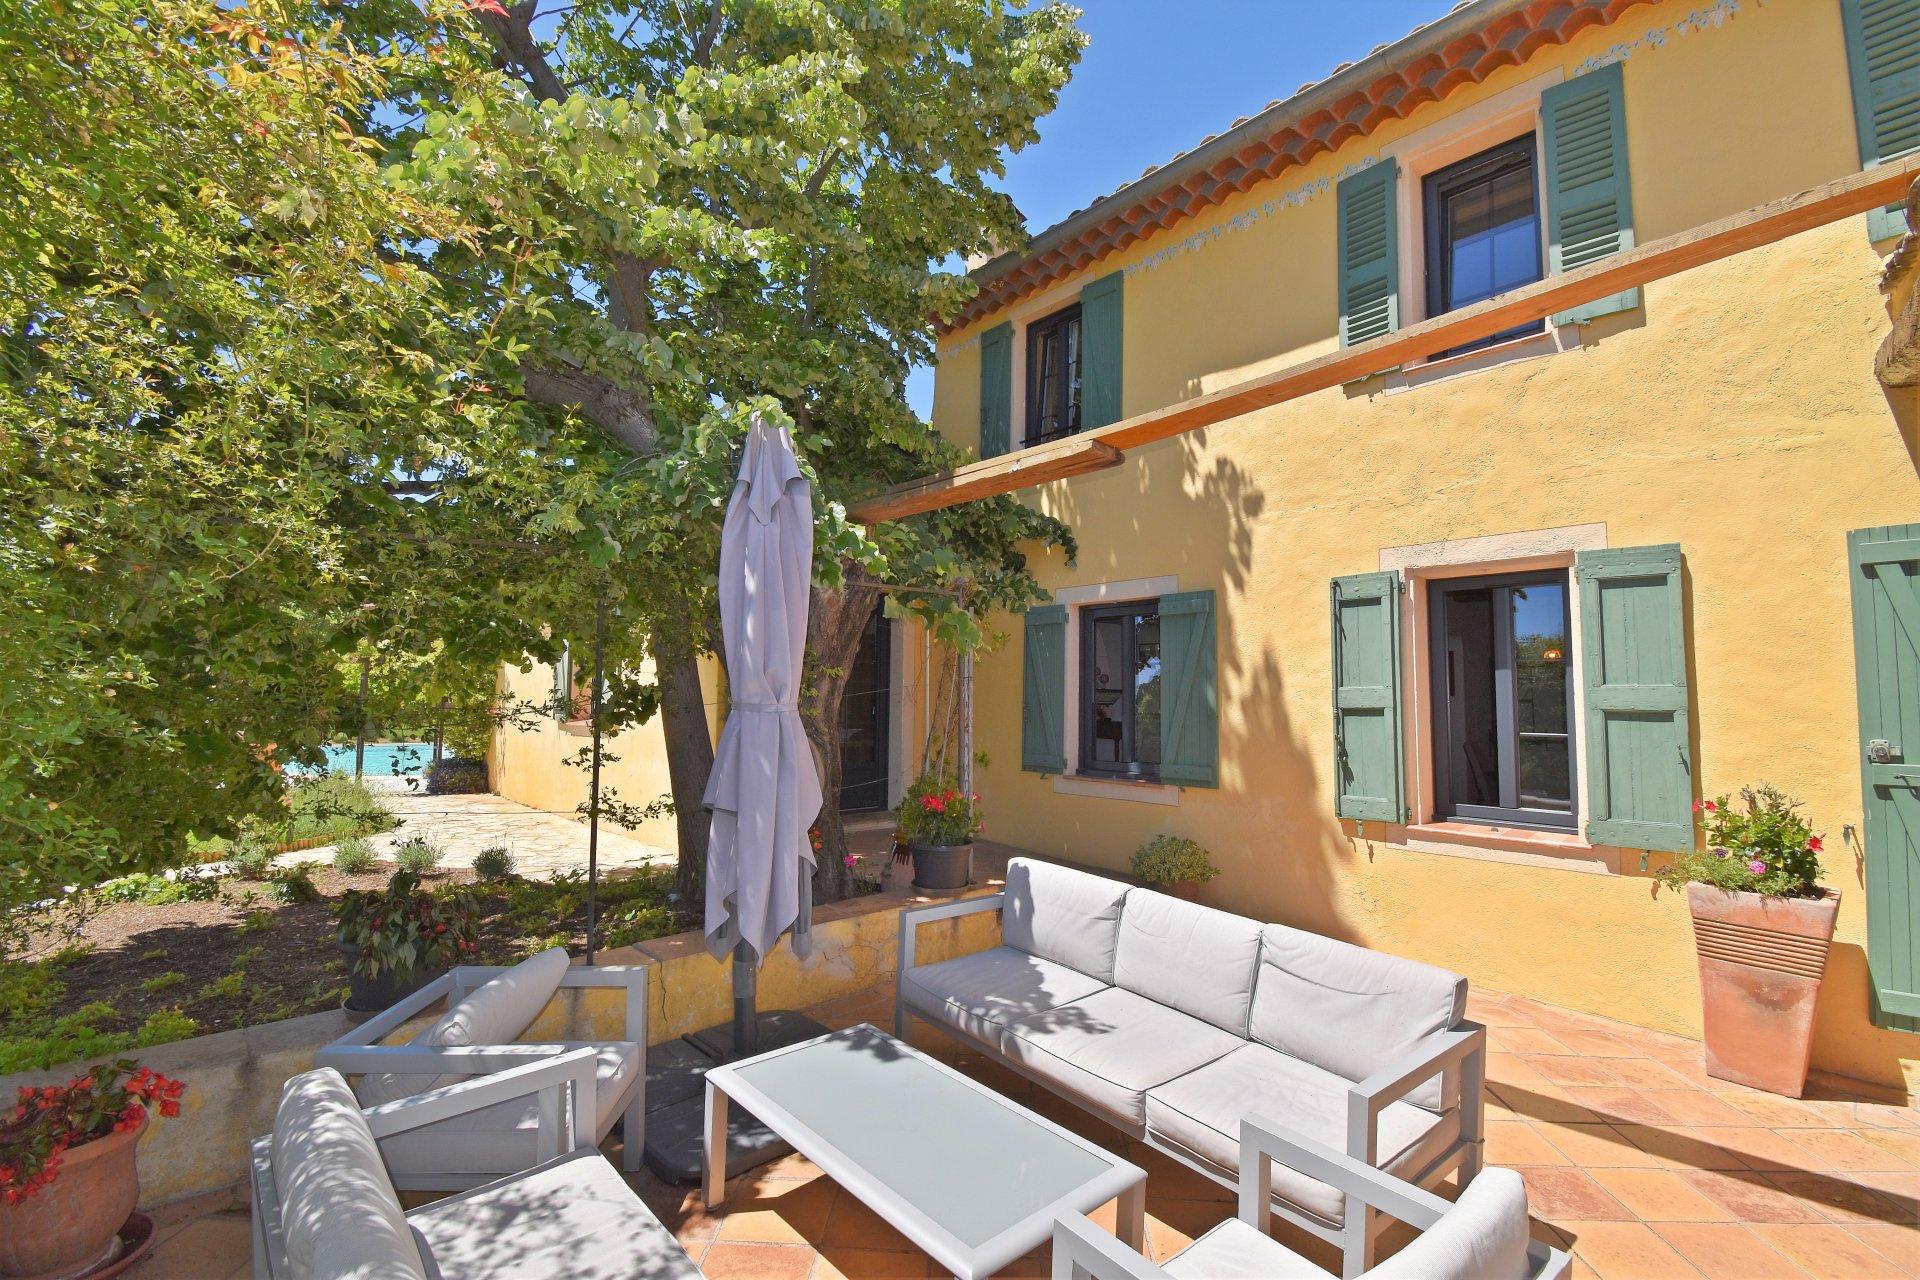 Verkoop Villa - Lorgues